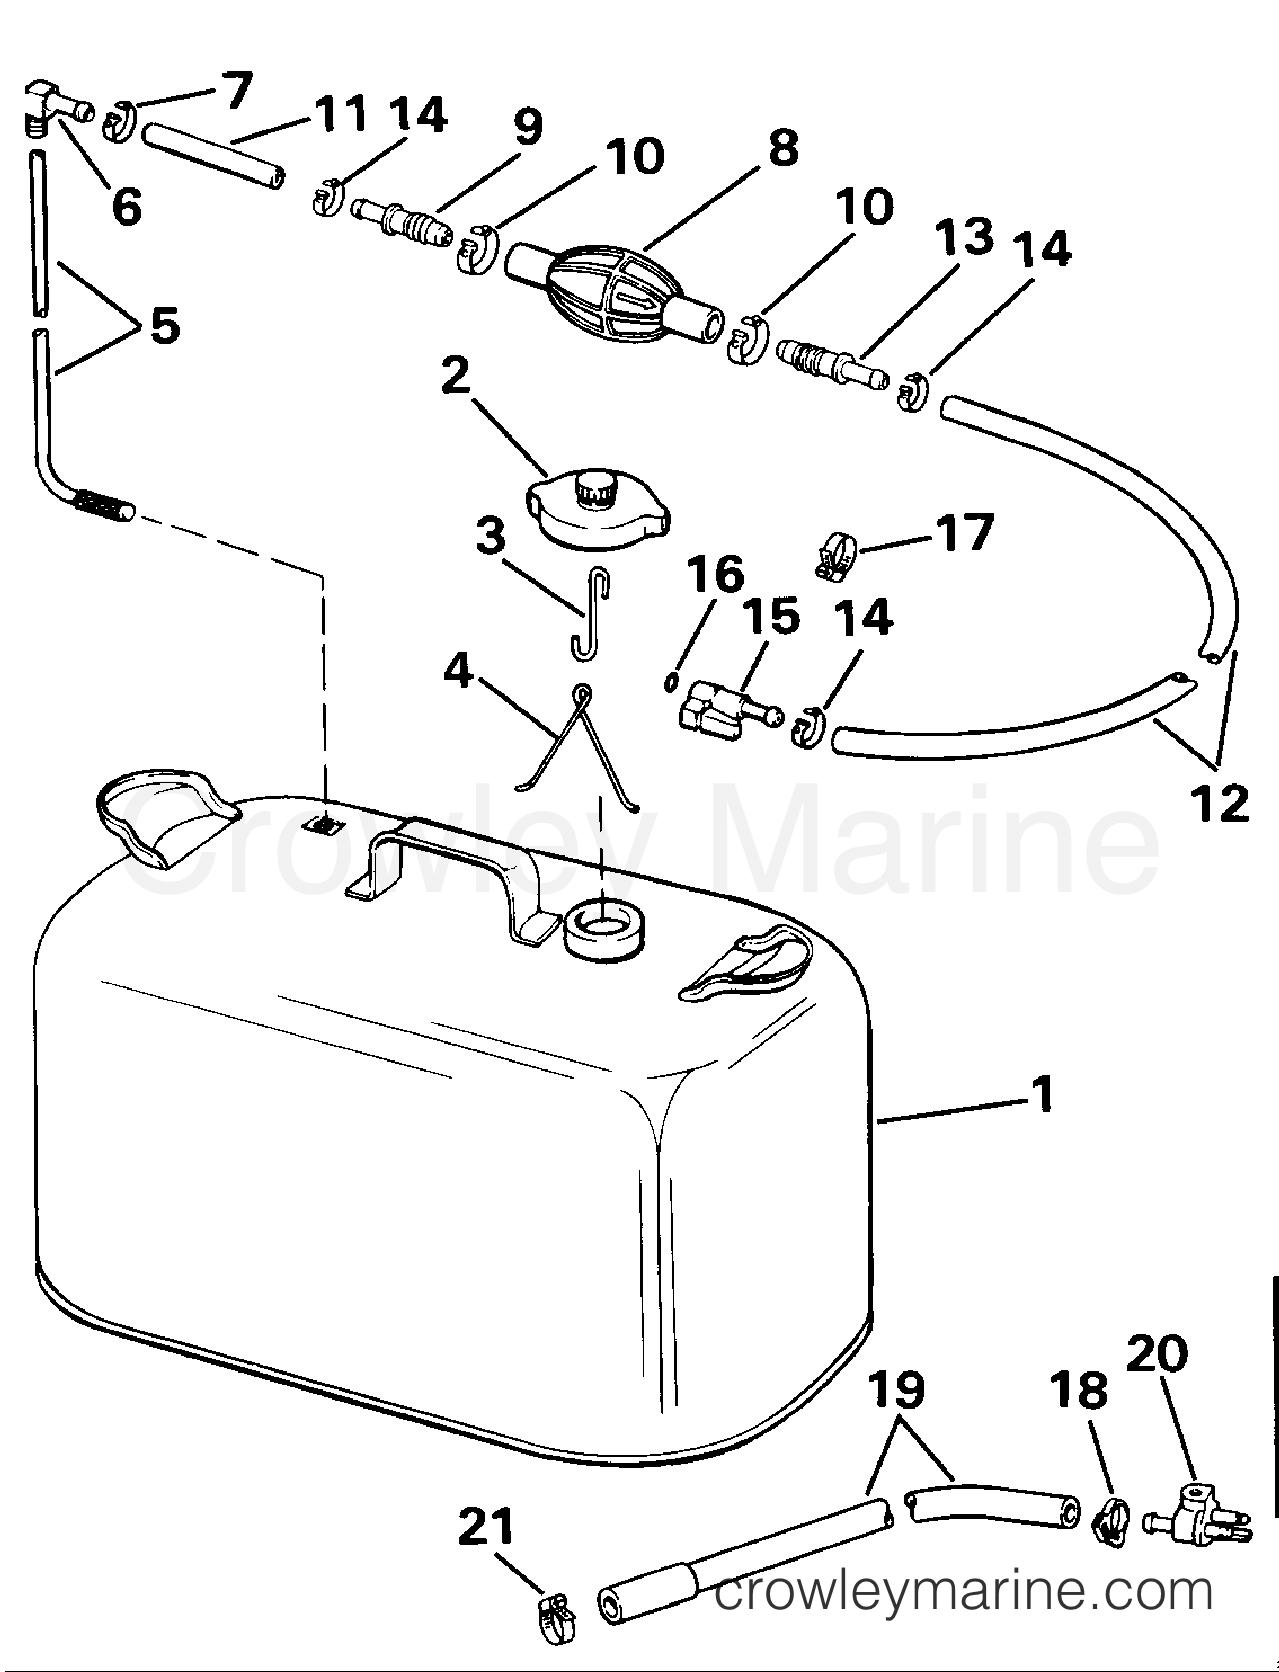 fuel gauge circuit diagram � fuel tank